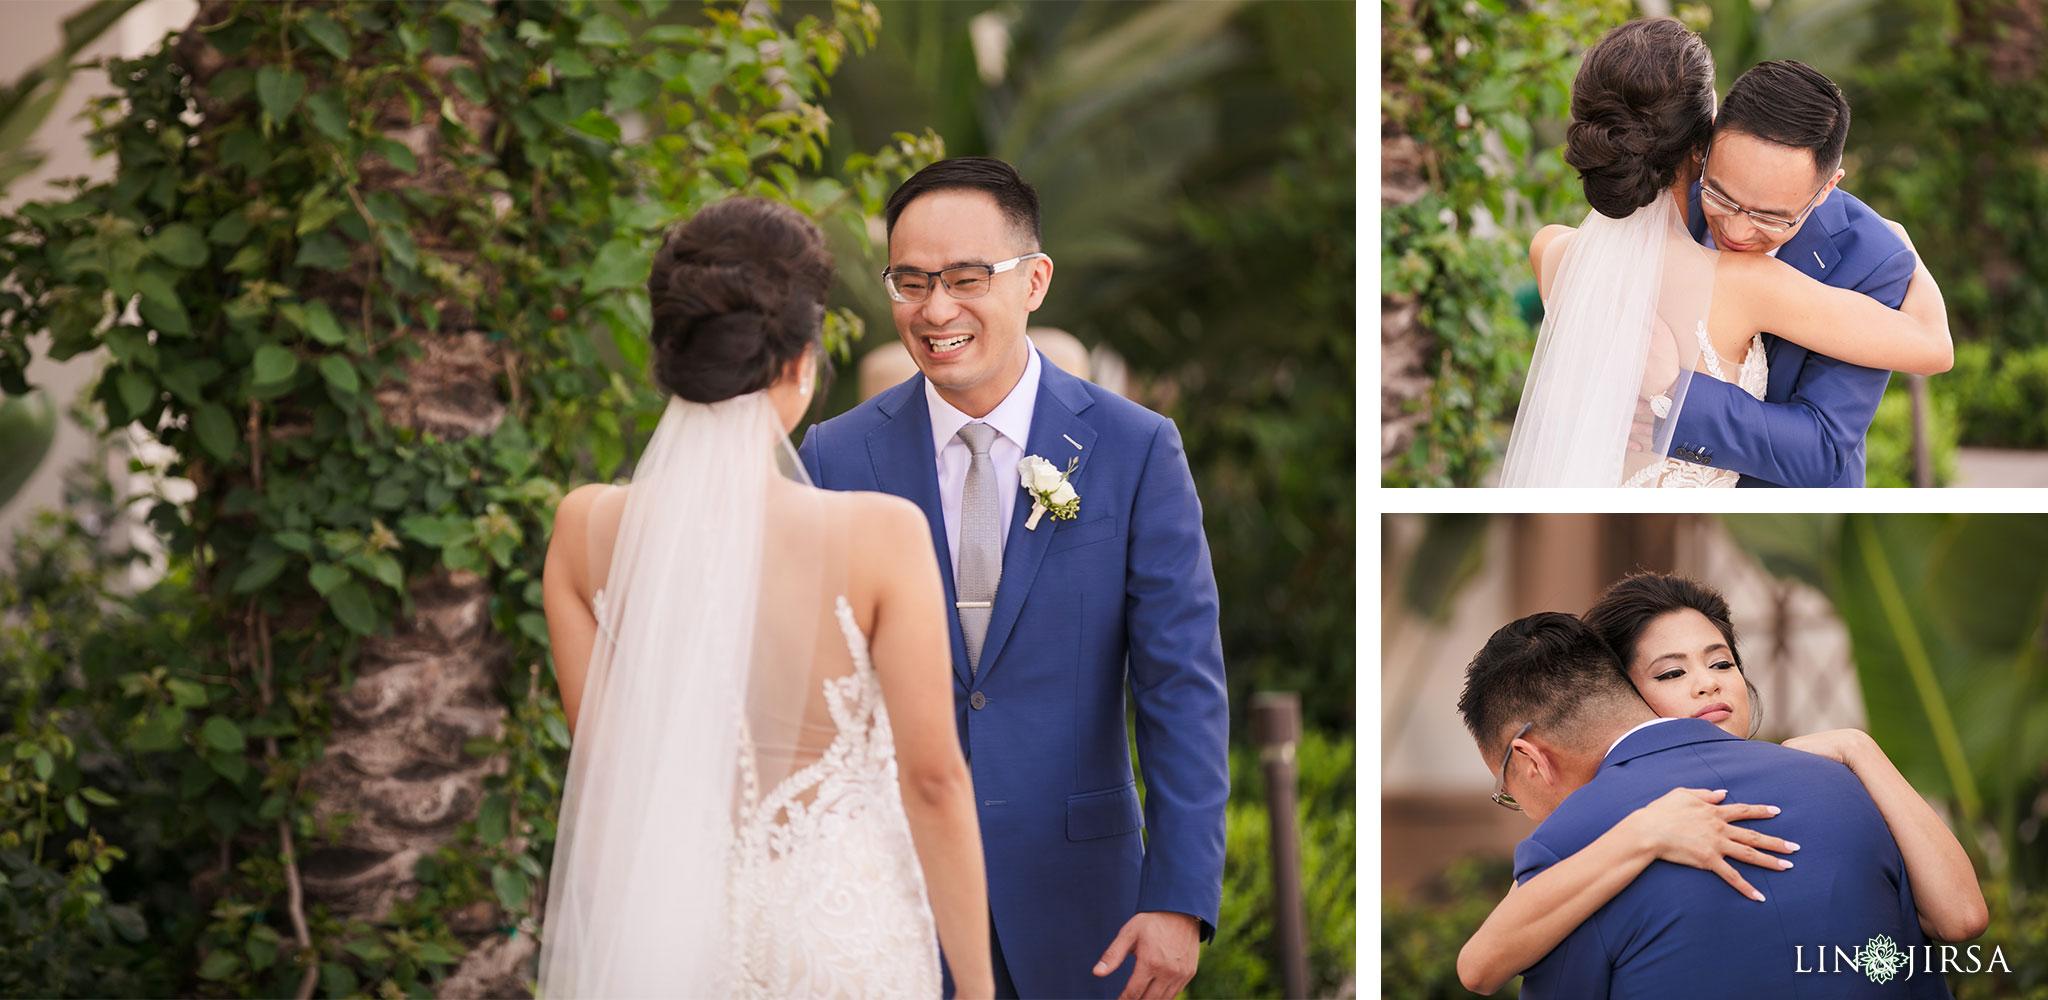 23 The Waterfront Beach Resort Huntington Beach Wedding Photography